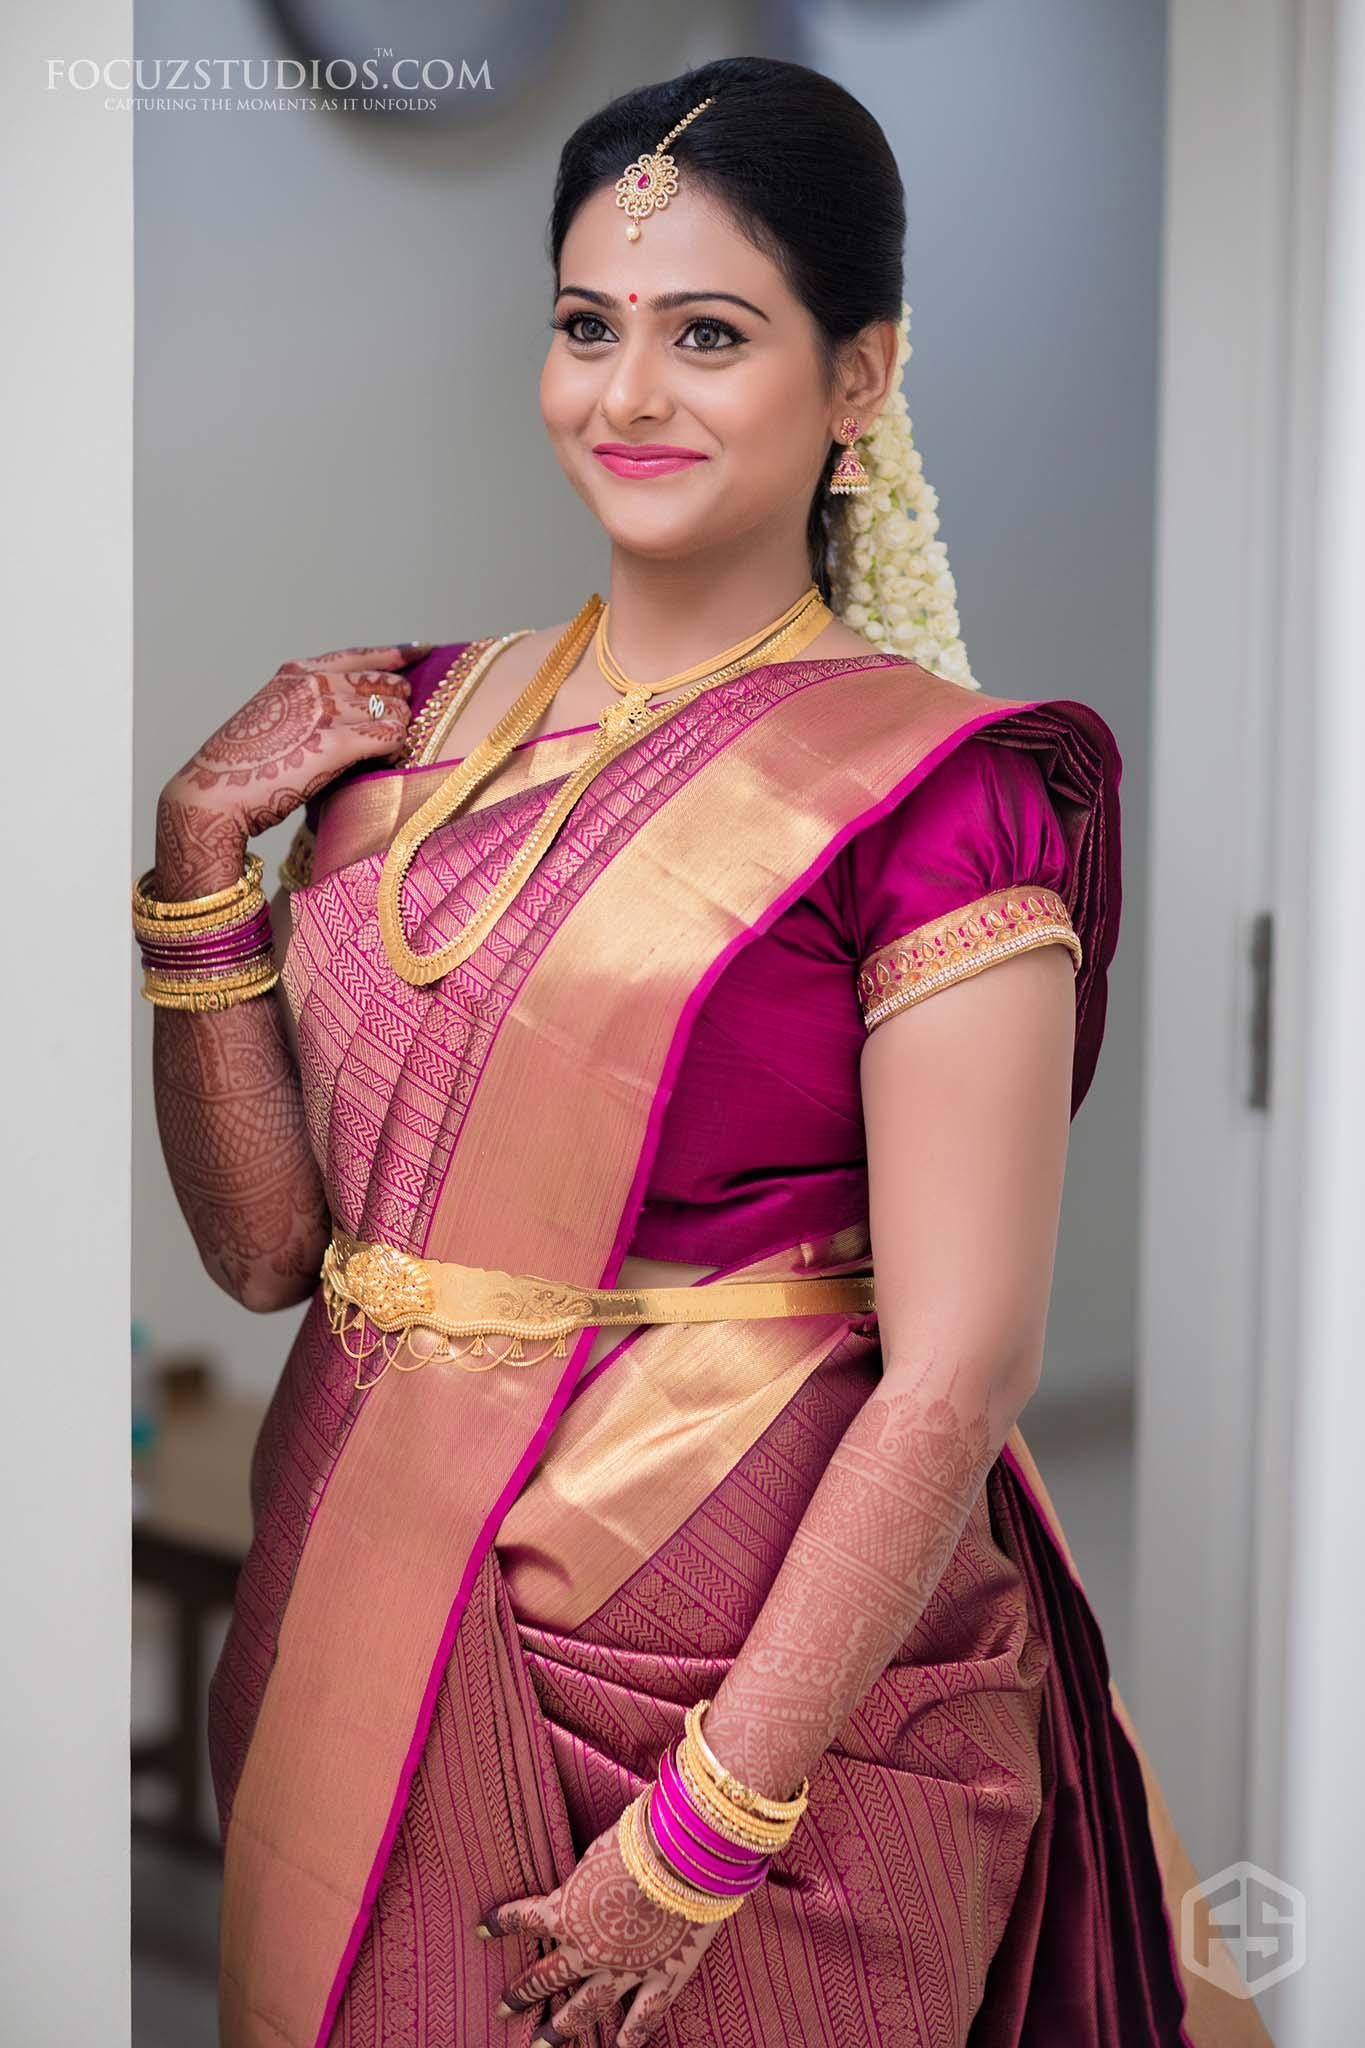 avm-rajeswari-kalyana-mandapam-wedding-photographers-photos-9